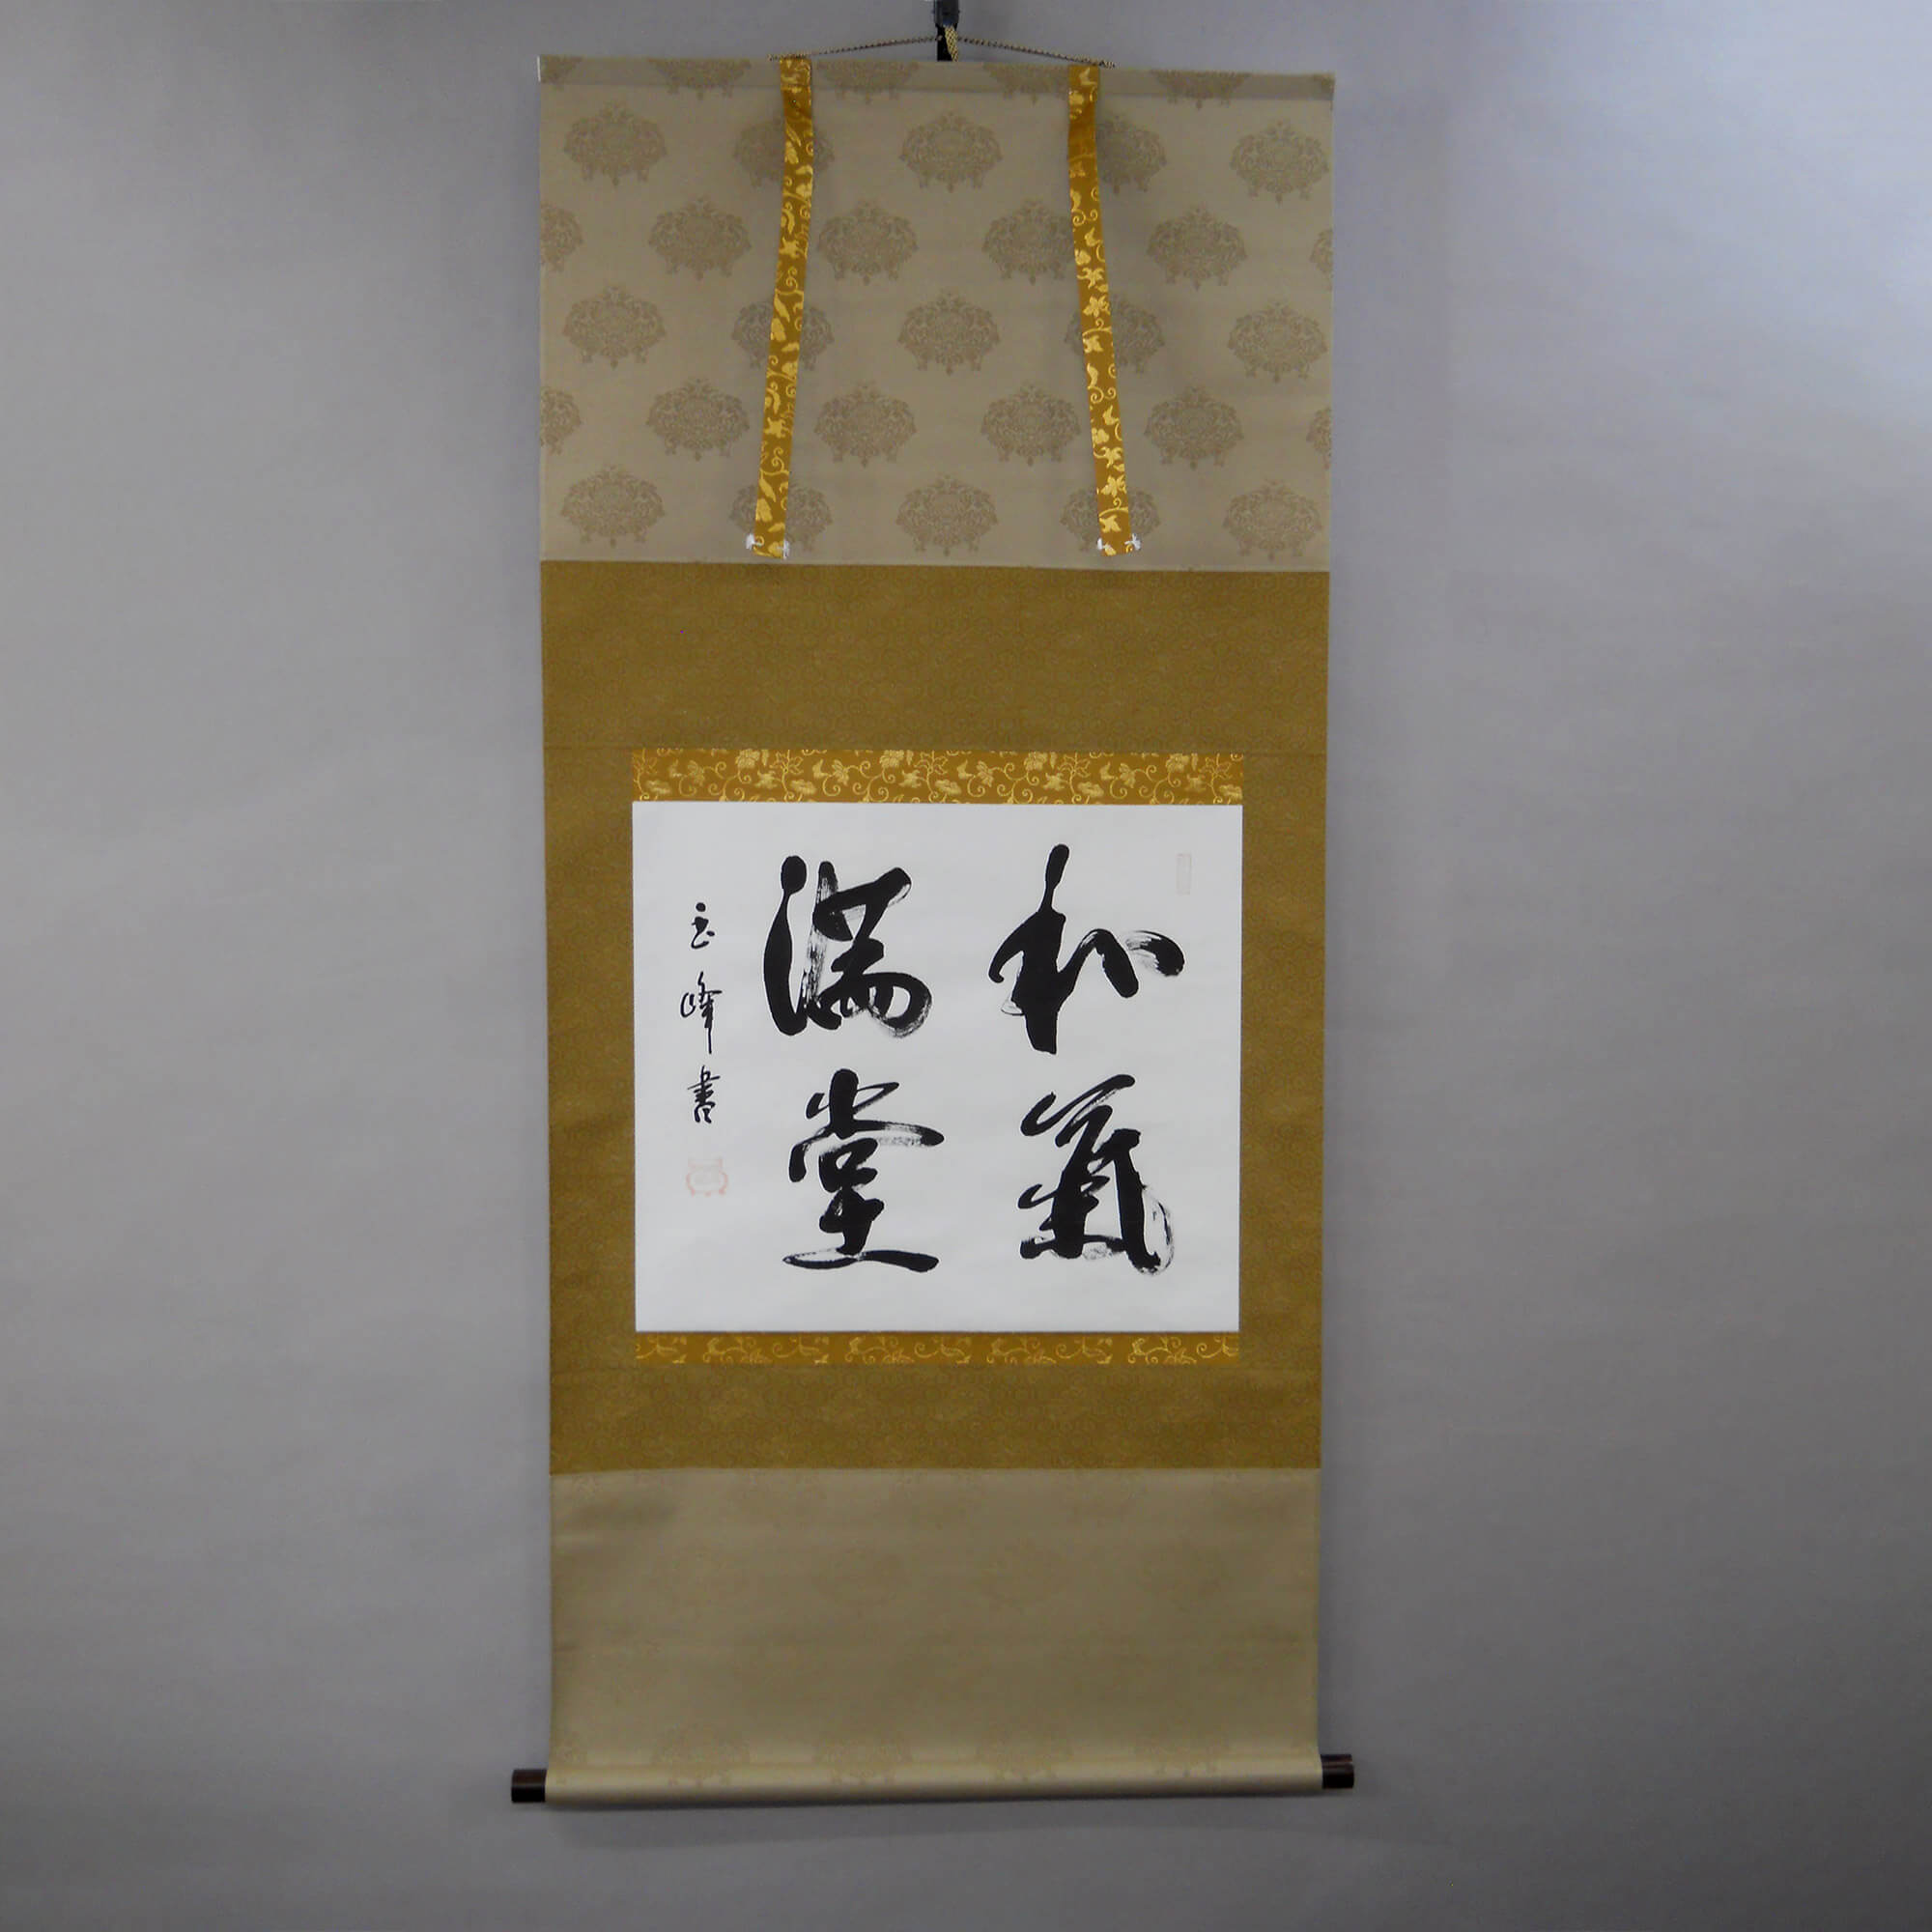 Calligraphy: Waki Dōni Mitsu / Gyokuhō Ueda